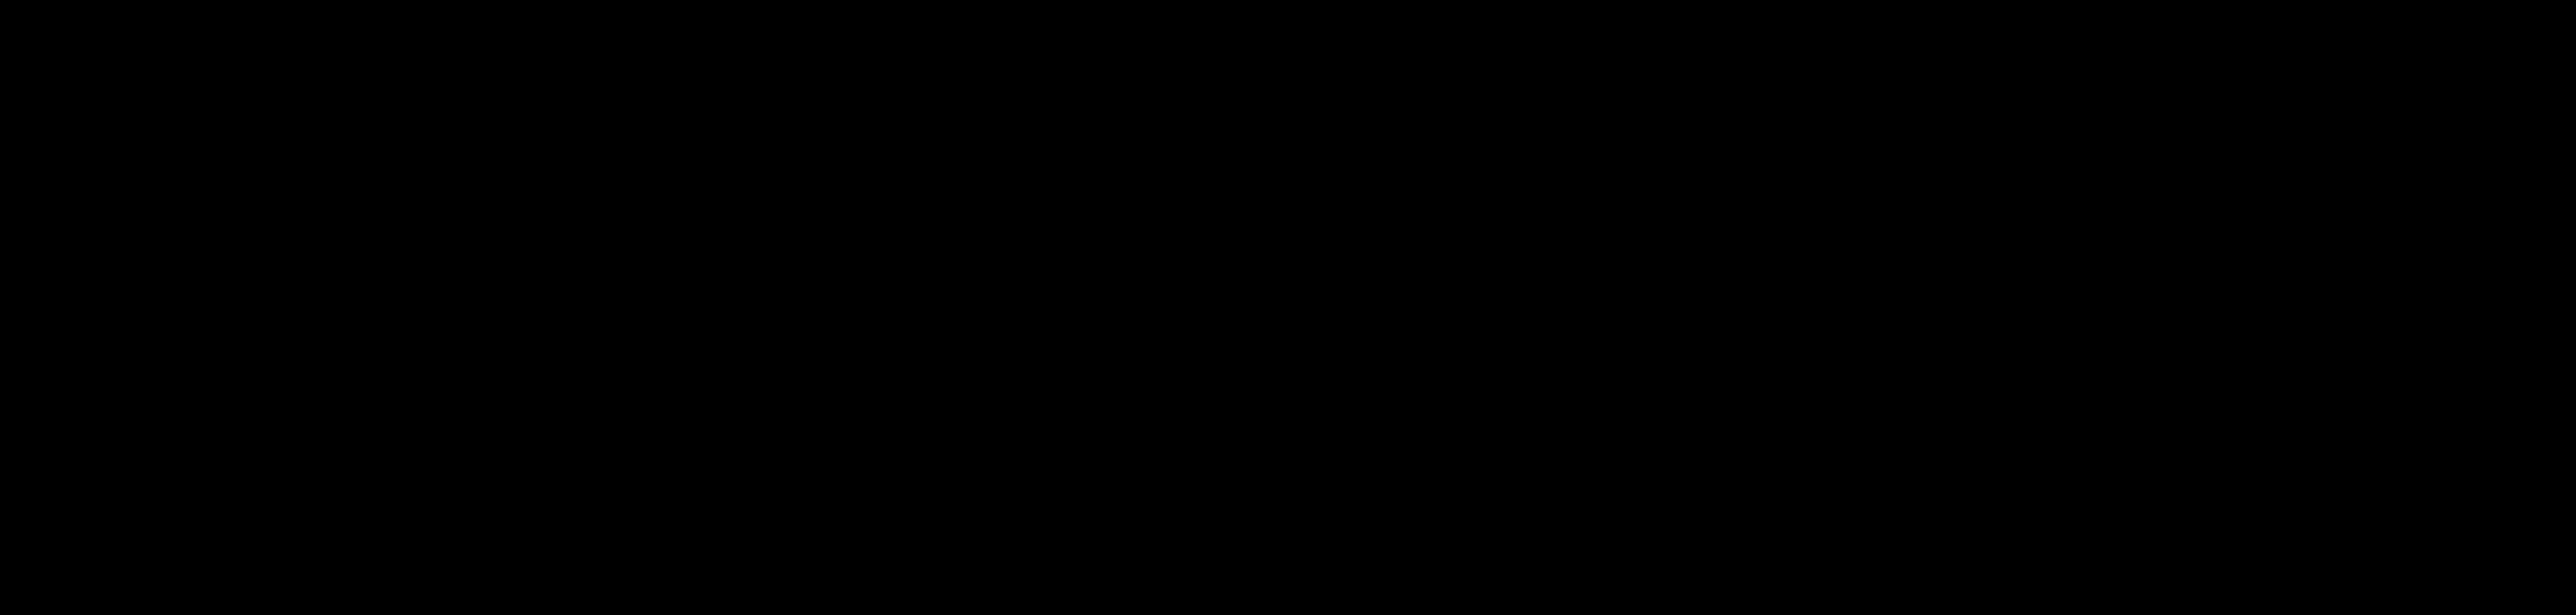 jay ortega logo seo web design